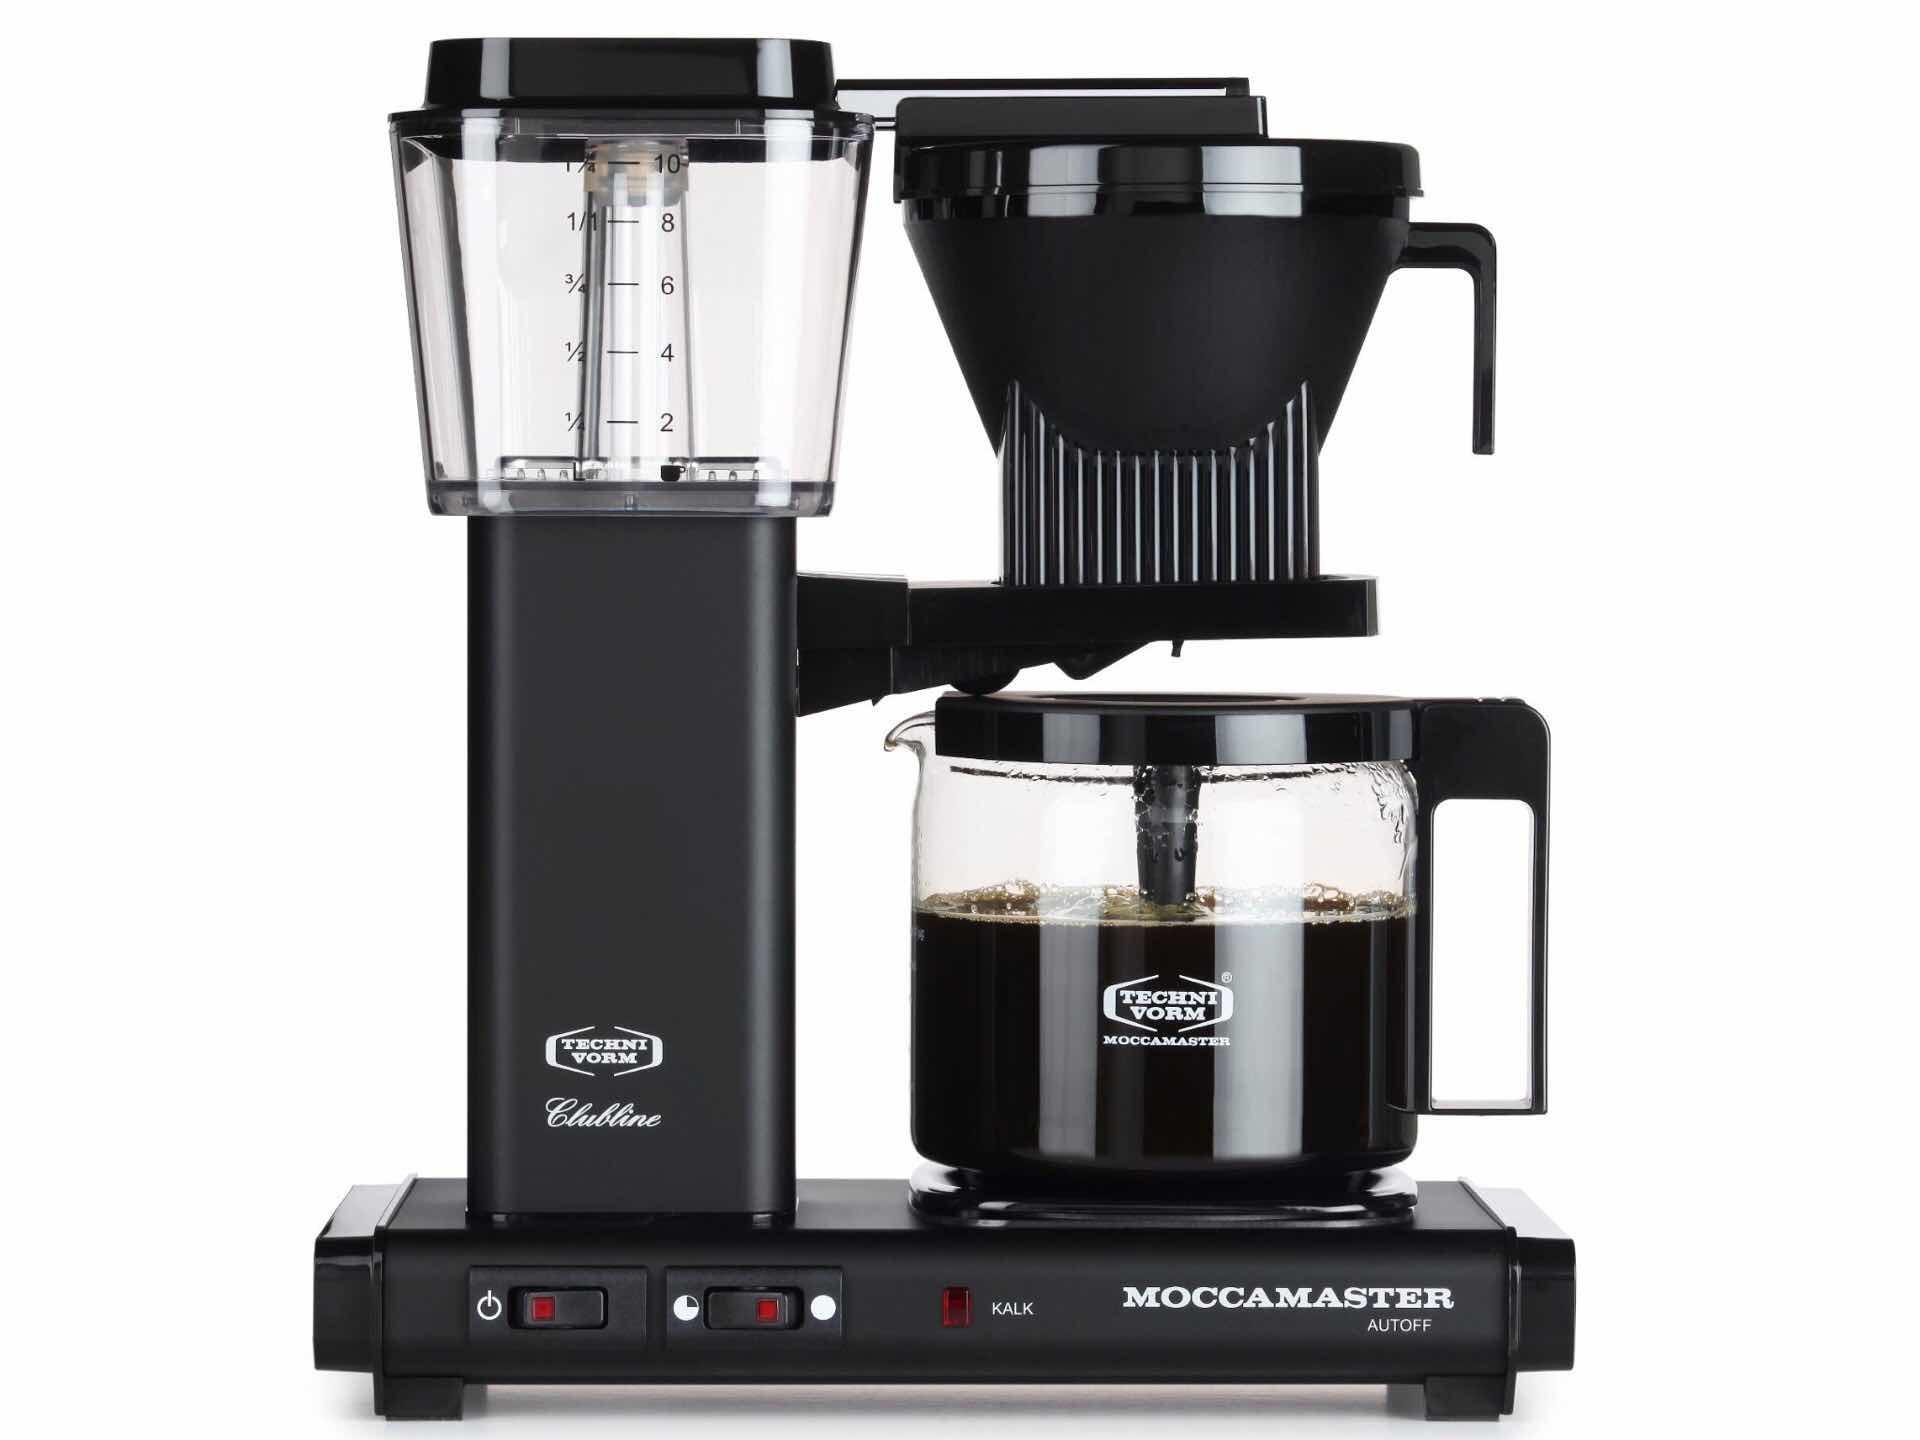 The Technivorm Moccamaster KBG drip coffee maker in matte black. ($329)